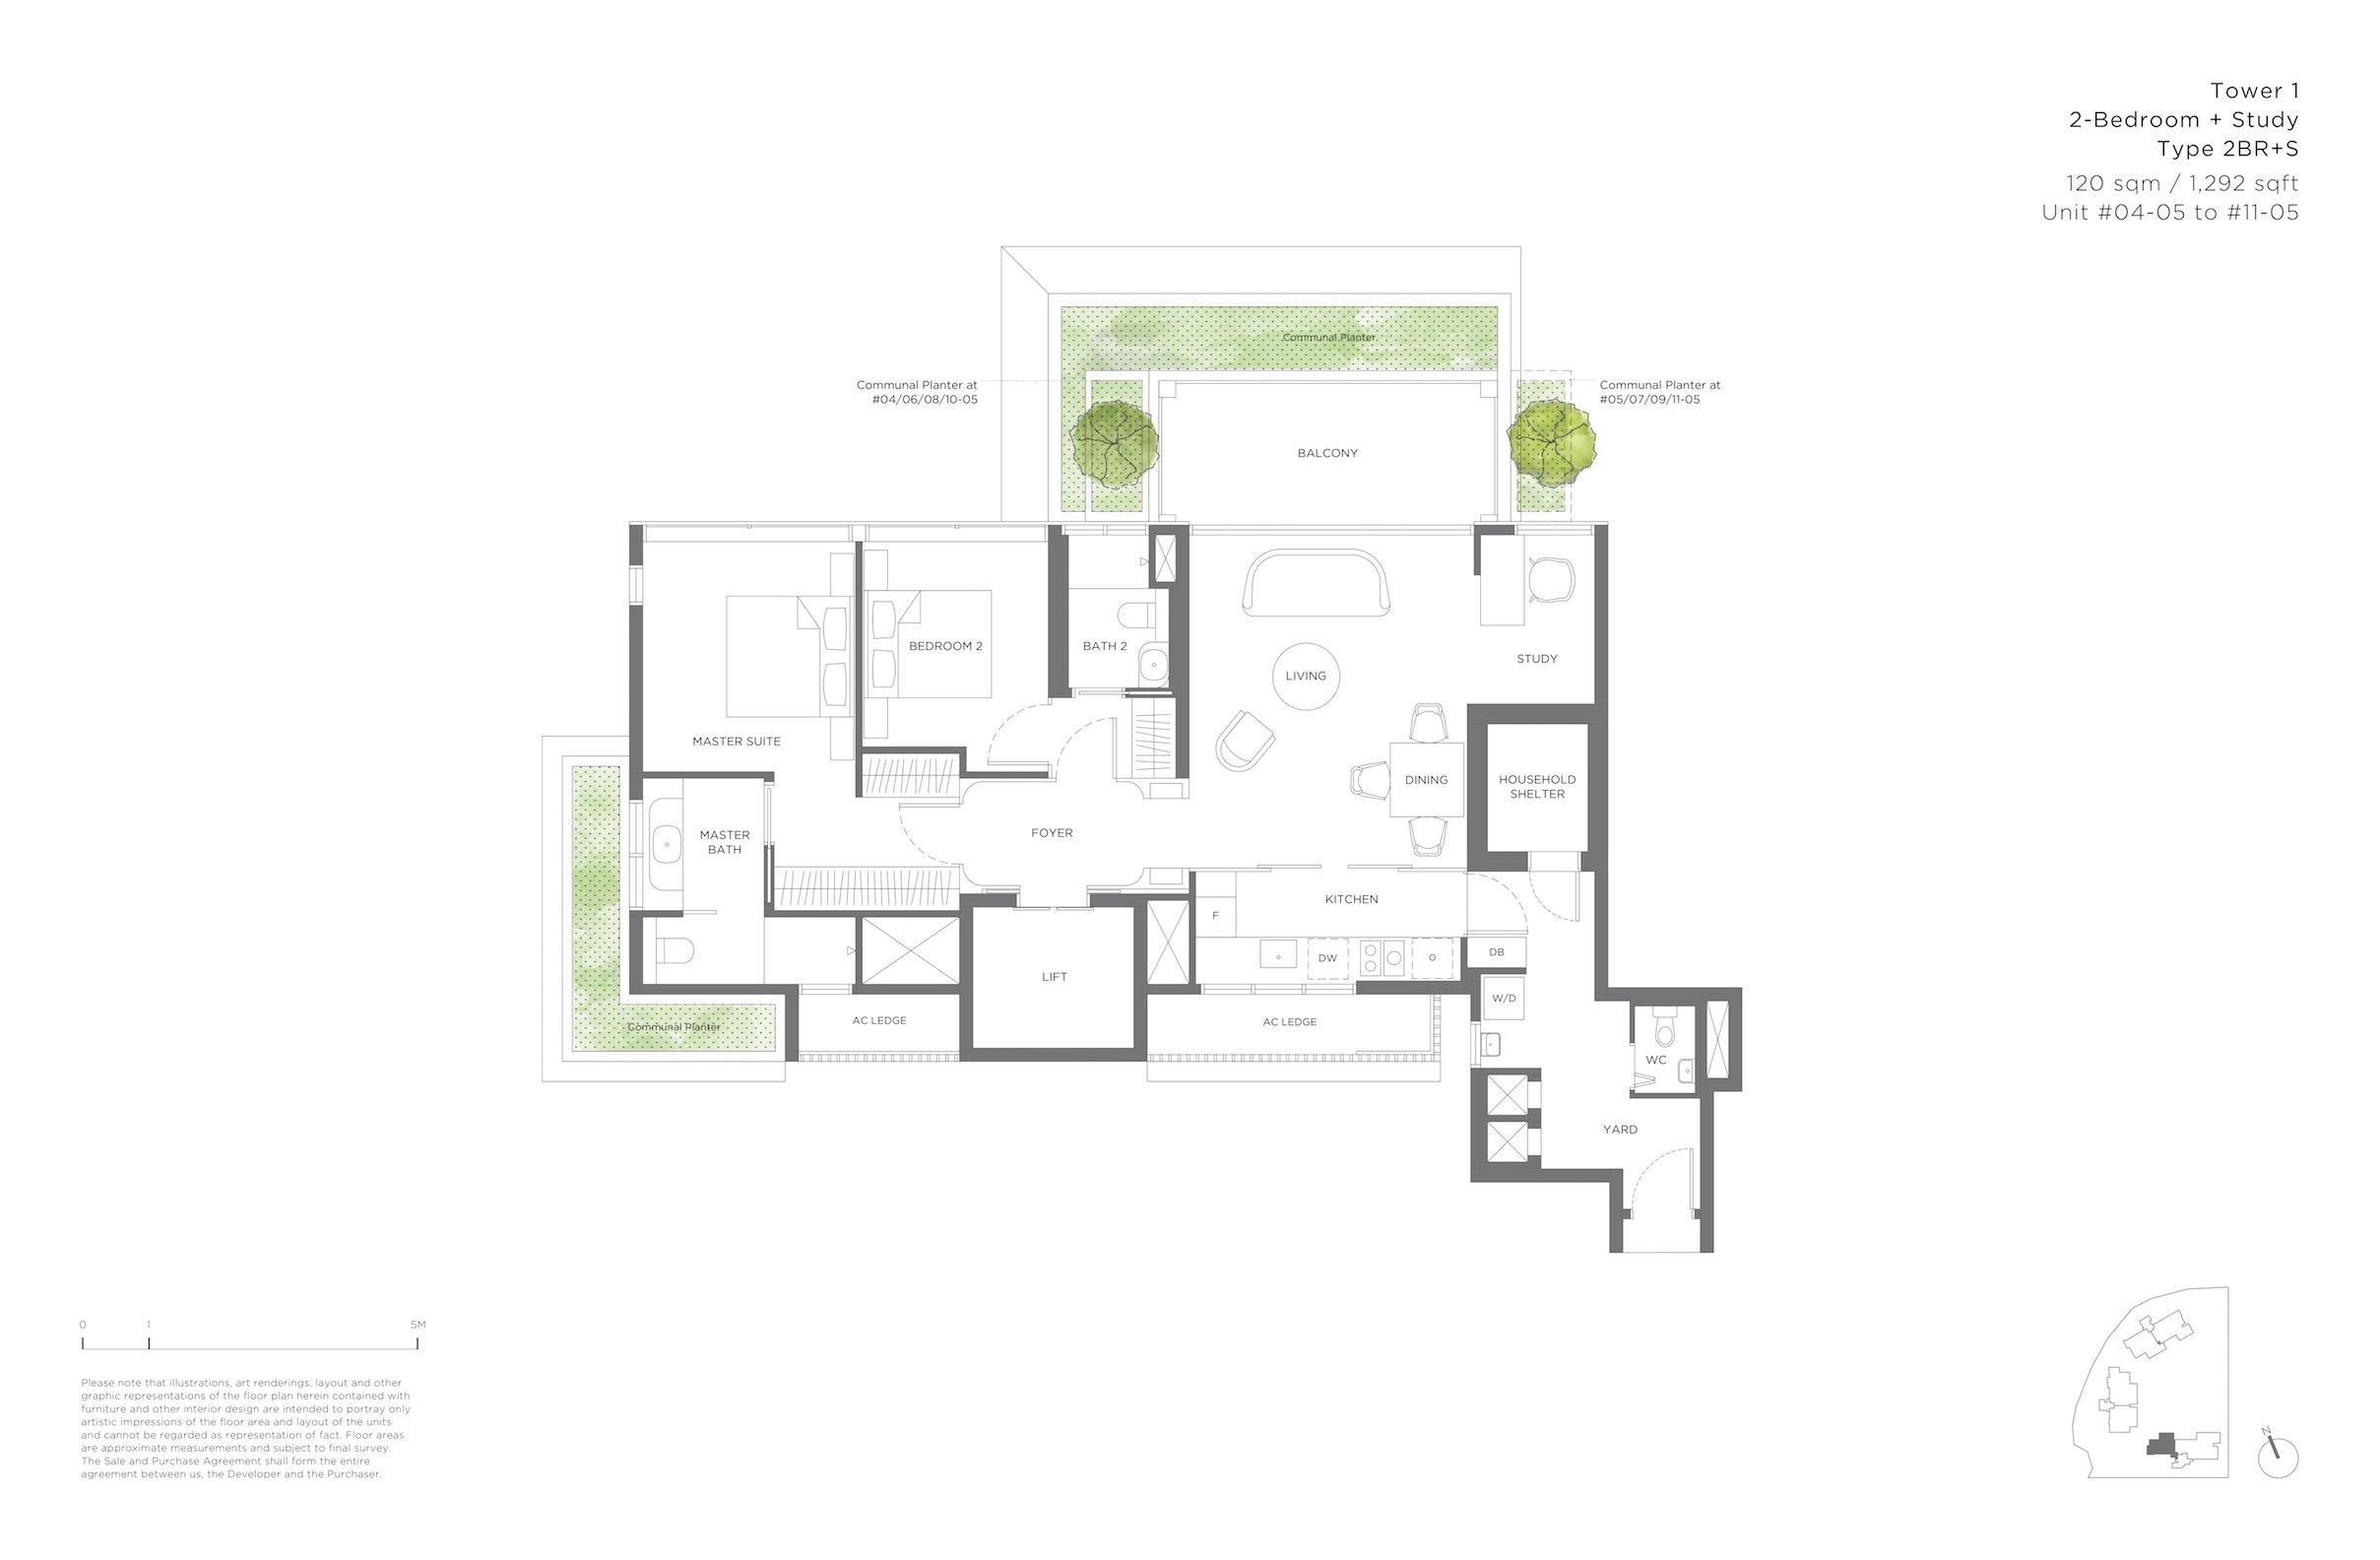 15 Holland Hill 荷兰山公寓 2-bedroom study 2br+s